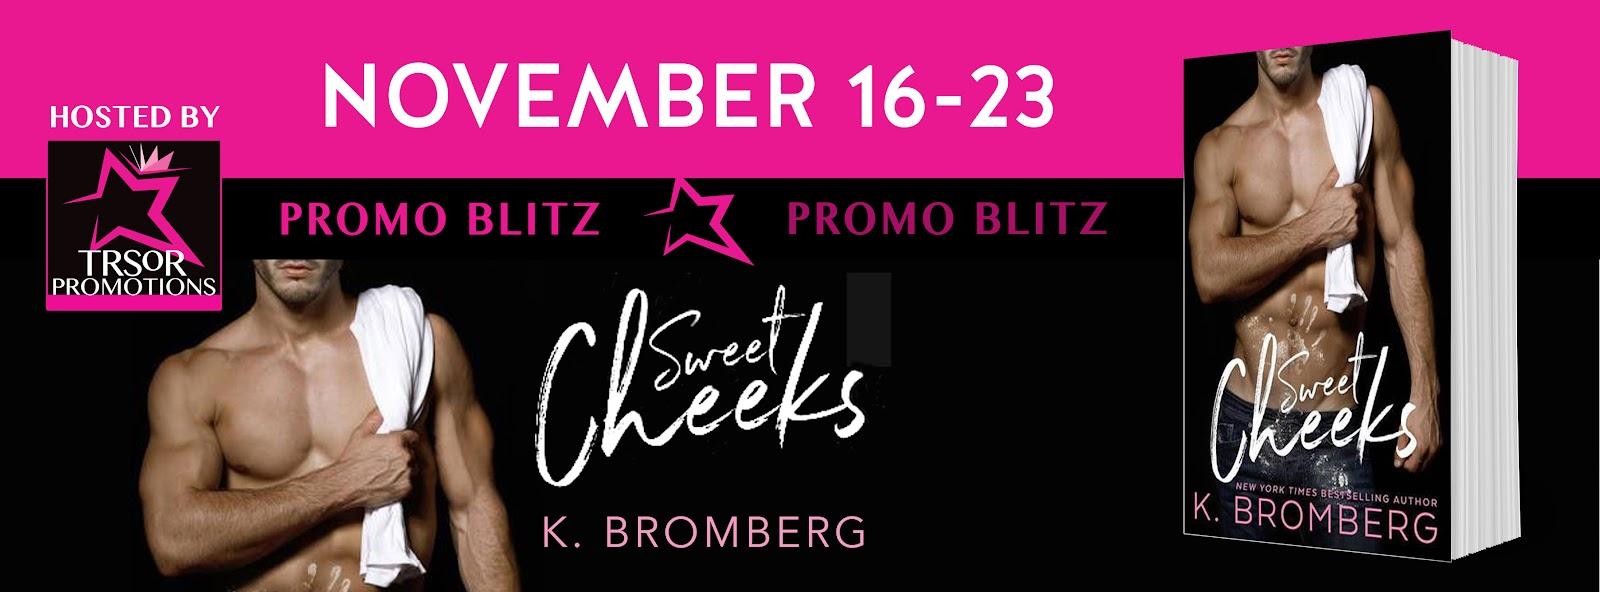 SWEET_CHEEKS_PROMO_BLITZ.jpg